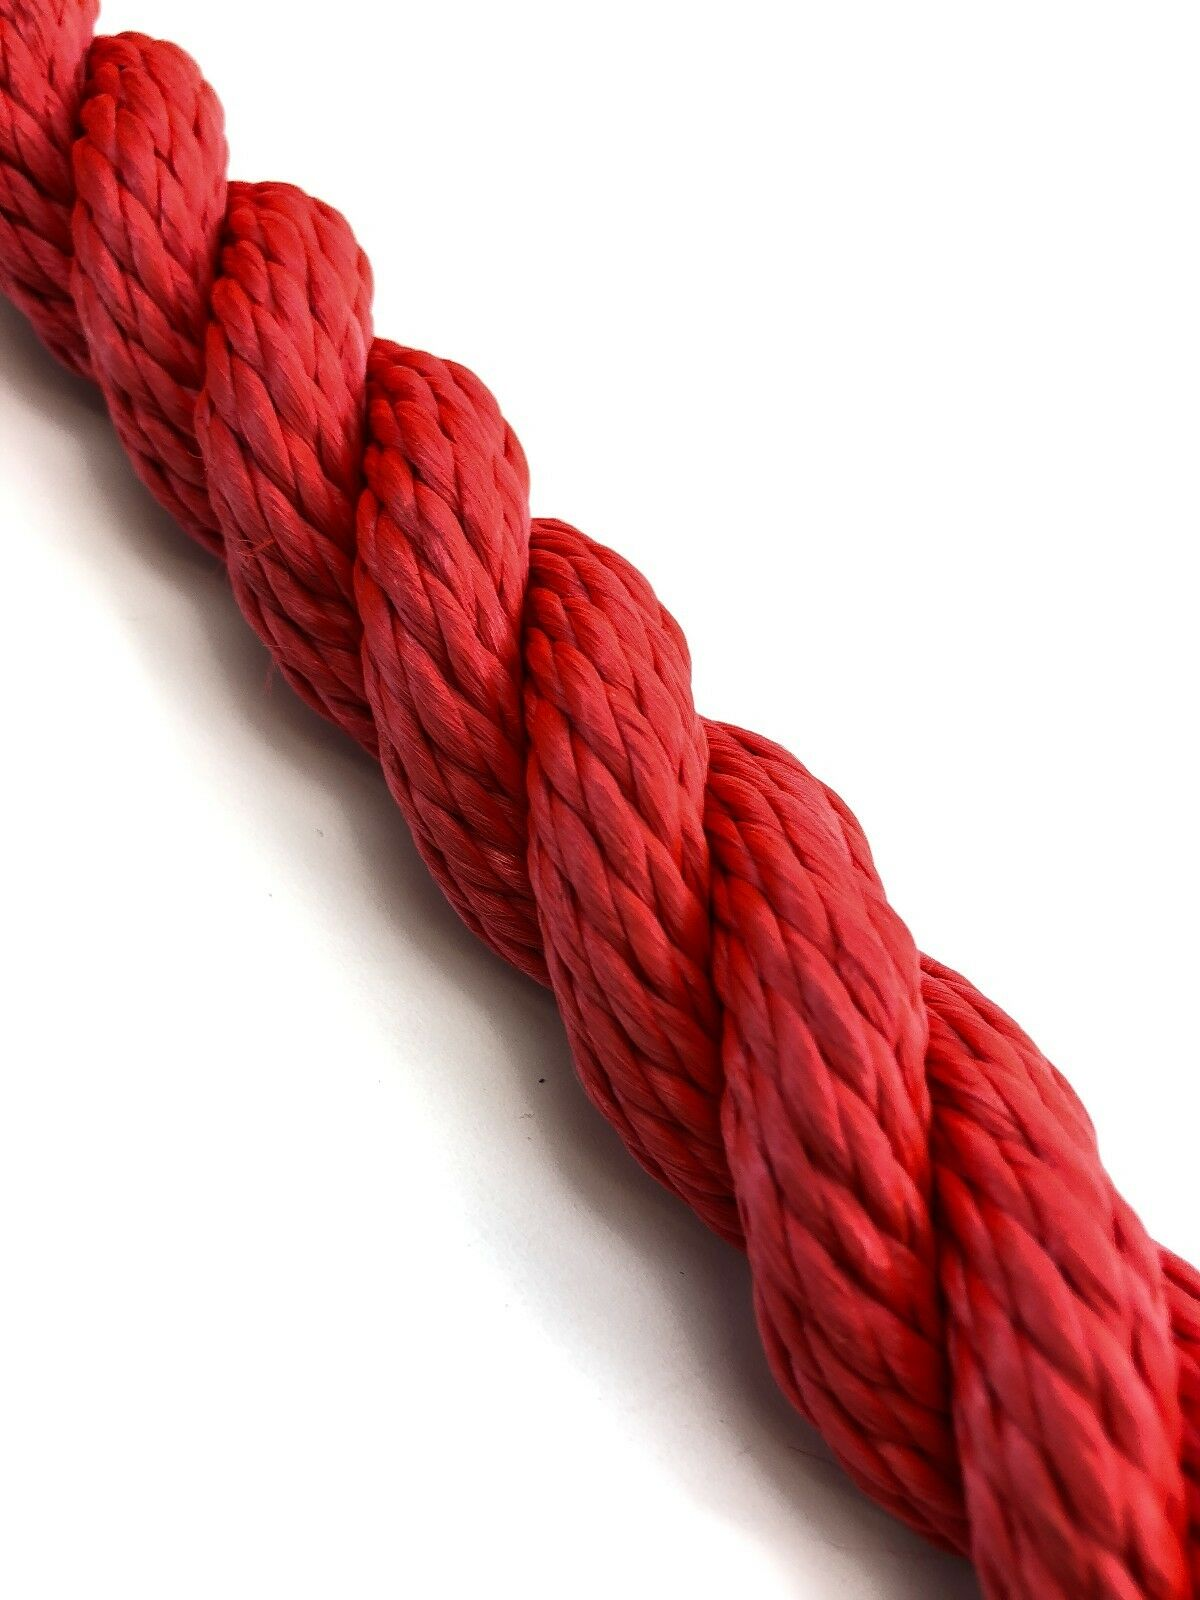 24mm rot 3-Strang Multifilament x 75 m (schwimmende Seil) Seil) (schwimmende Softline Seil 94f553